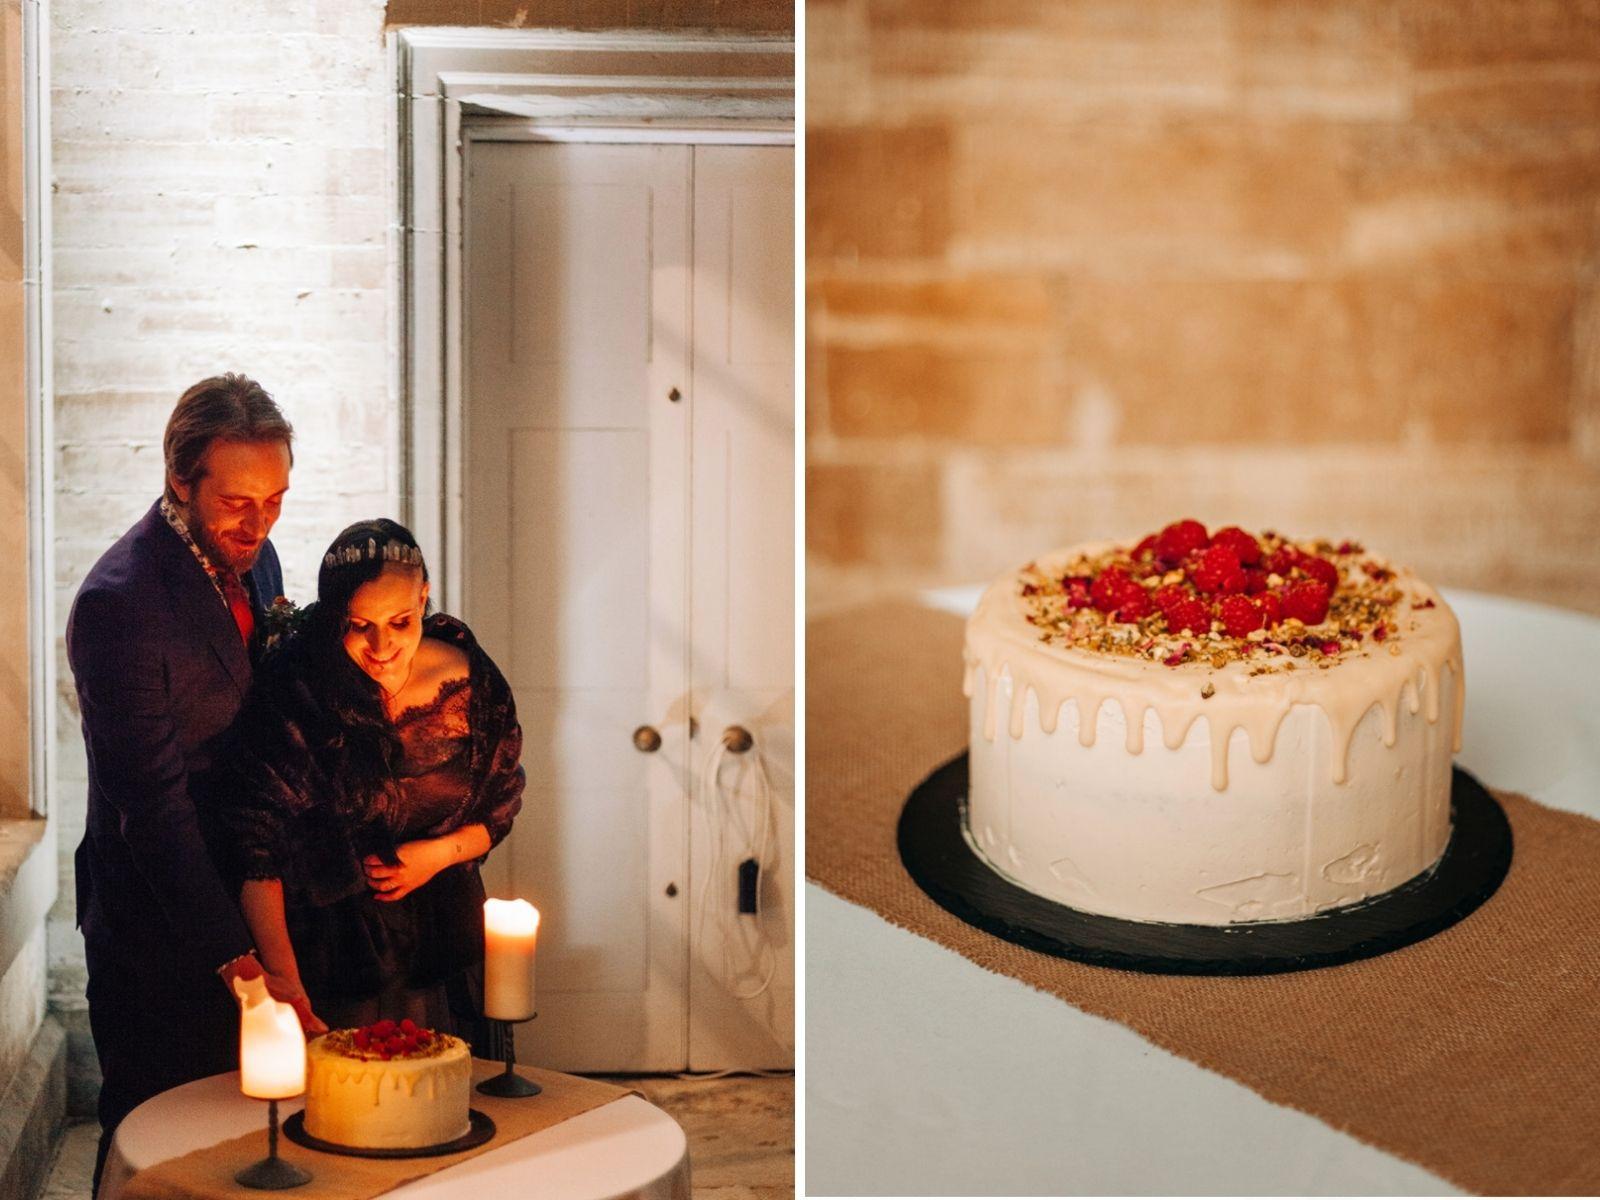 Understated wedding cake